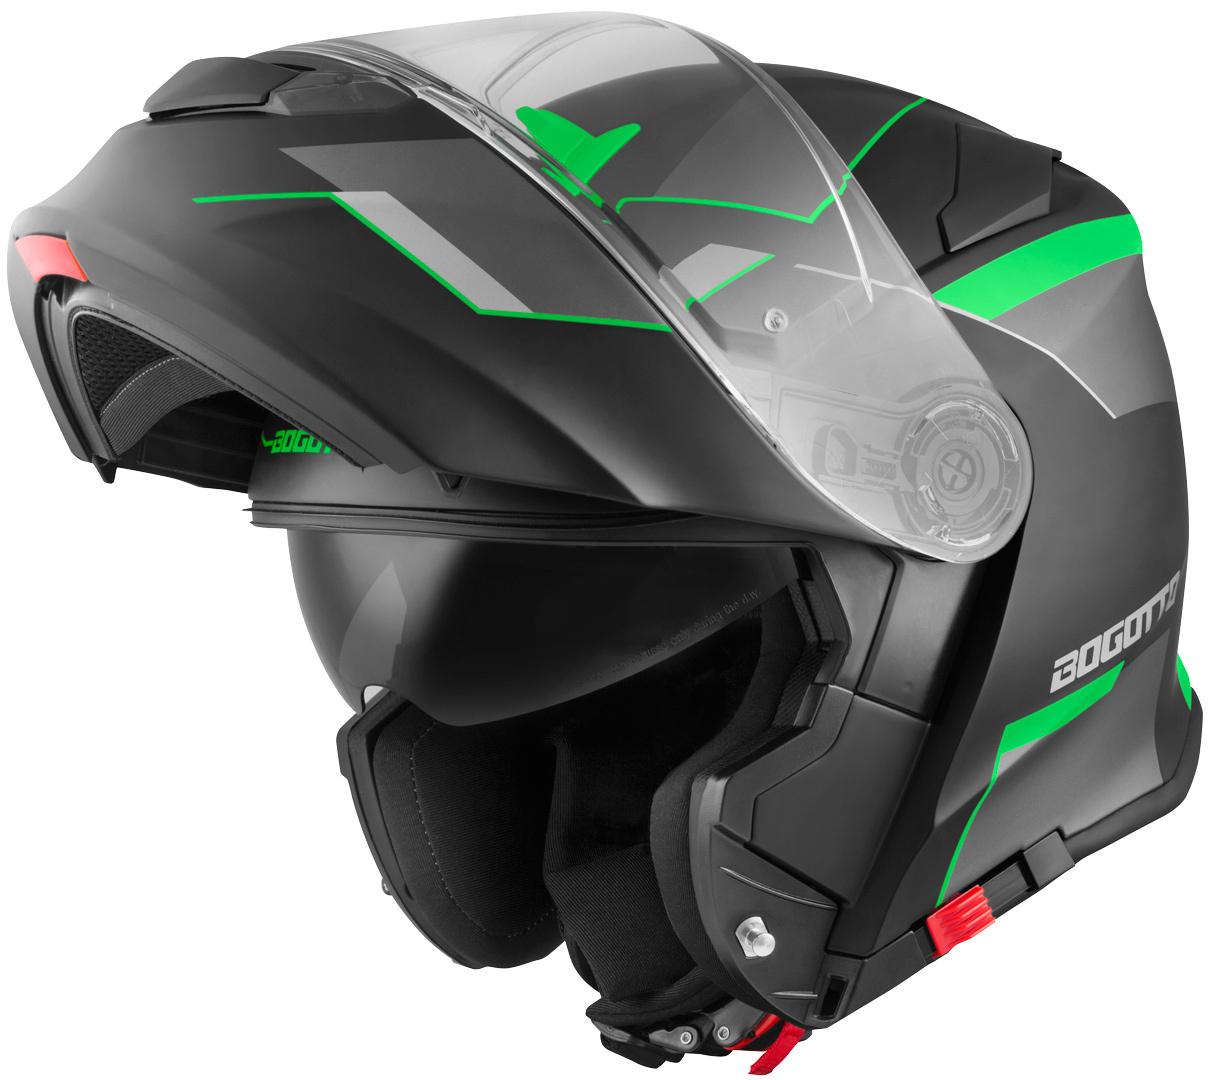 Bogotto V271 Delta Klapphelm, schwarz-grün, Größe XS, schwarz-grün, Größe XS